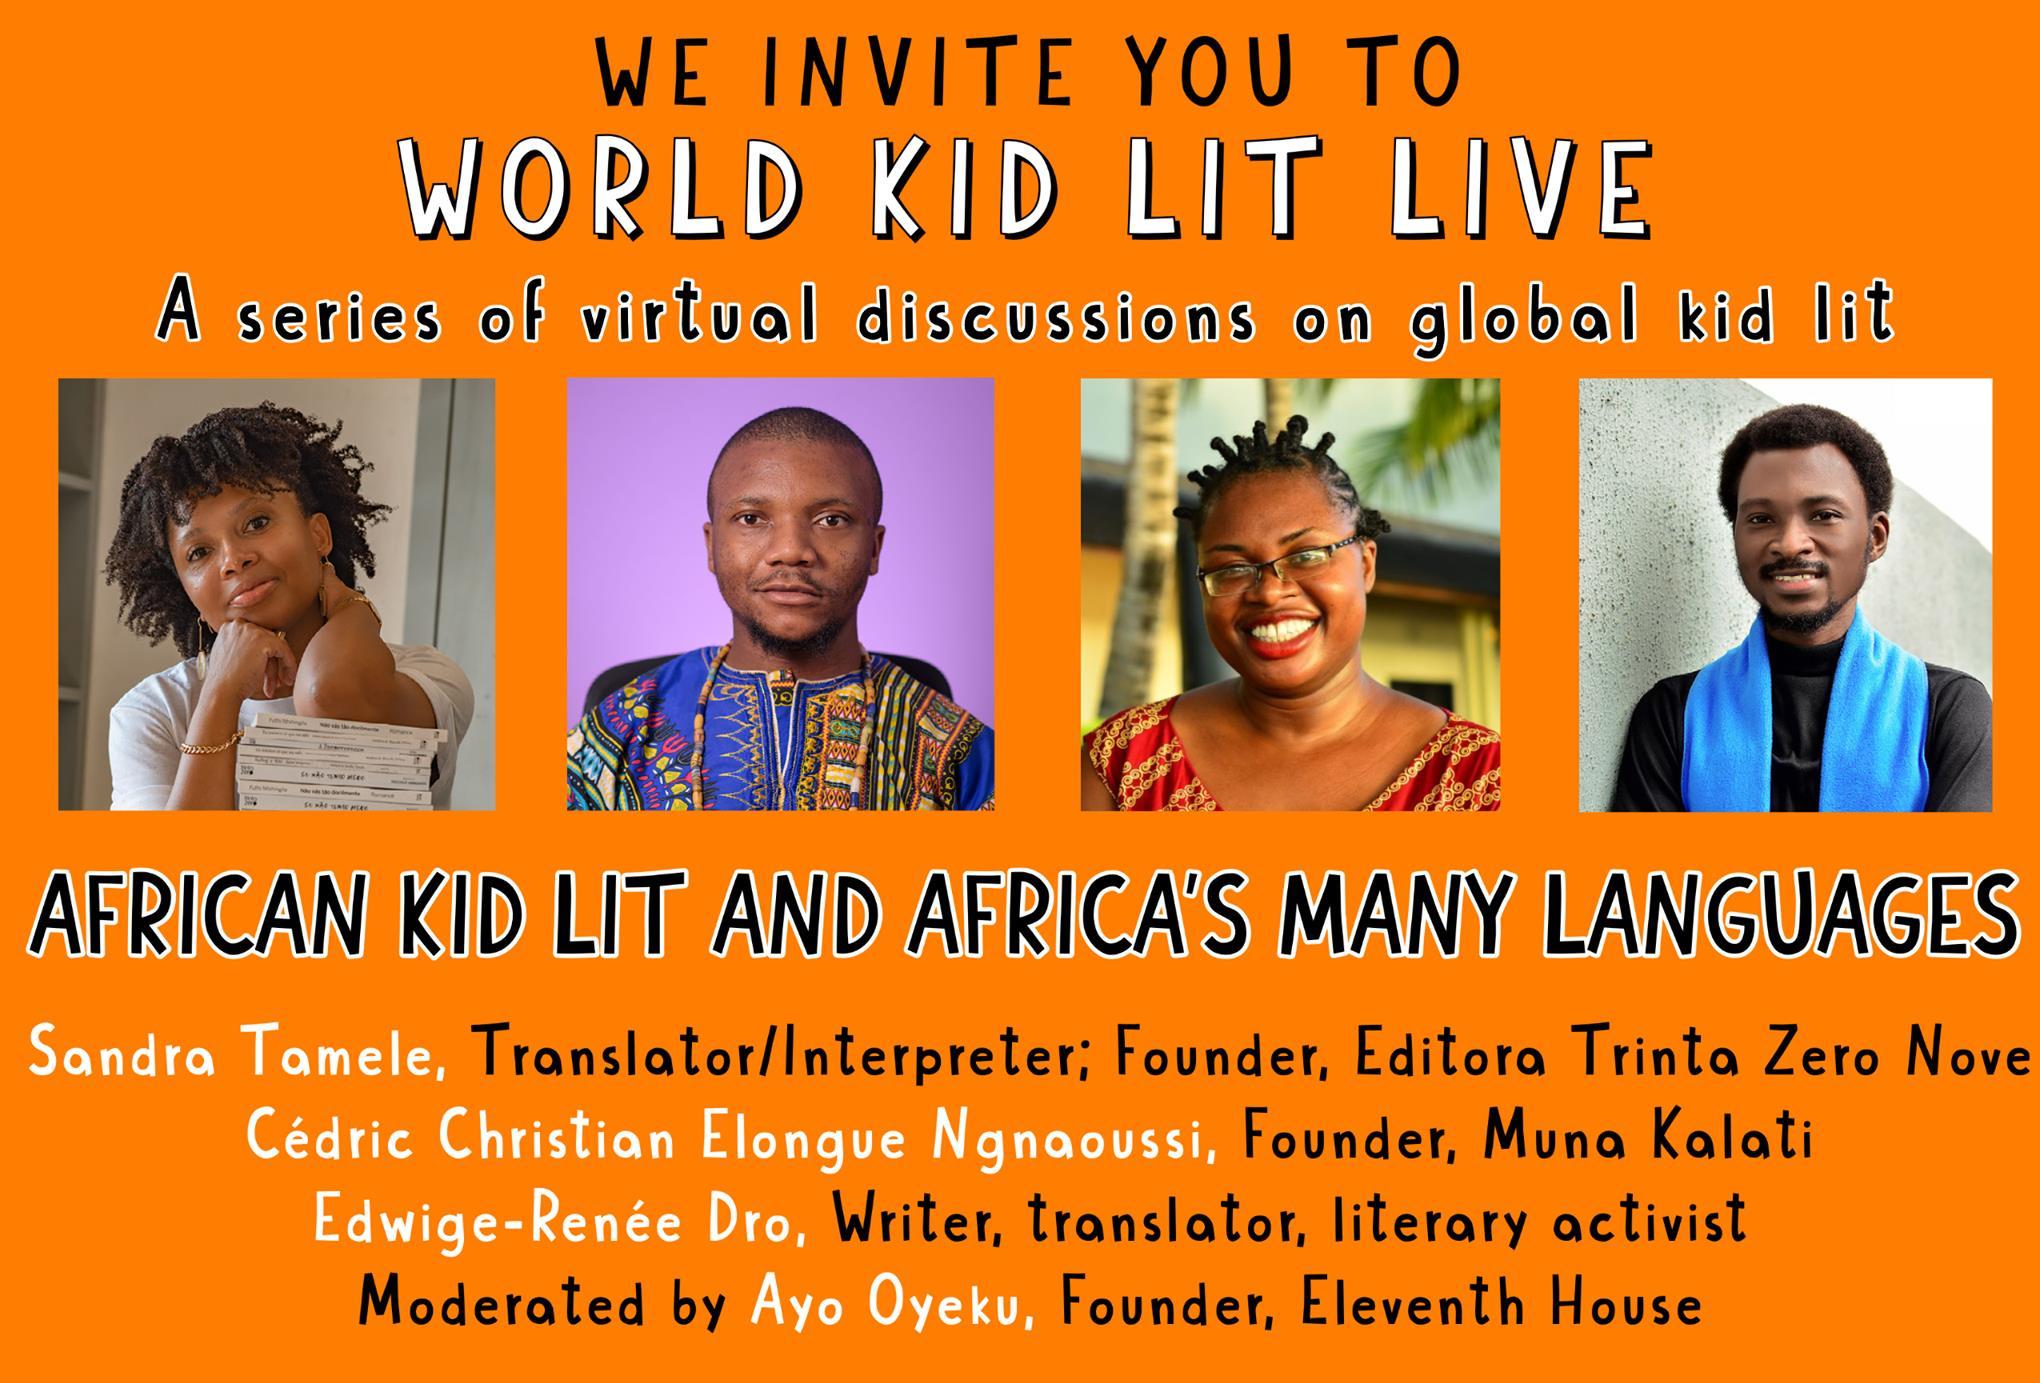 Banner showing photo of panel speakers Sandra Tamele, Christian Elongue, Edwige-Renée Dro and Ayo Oyeku